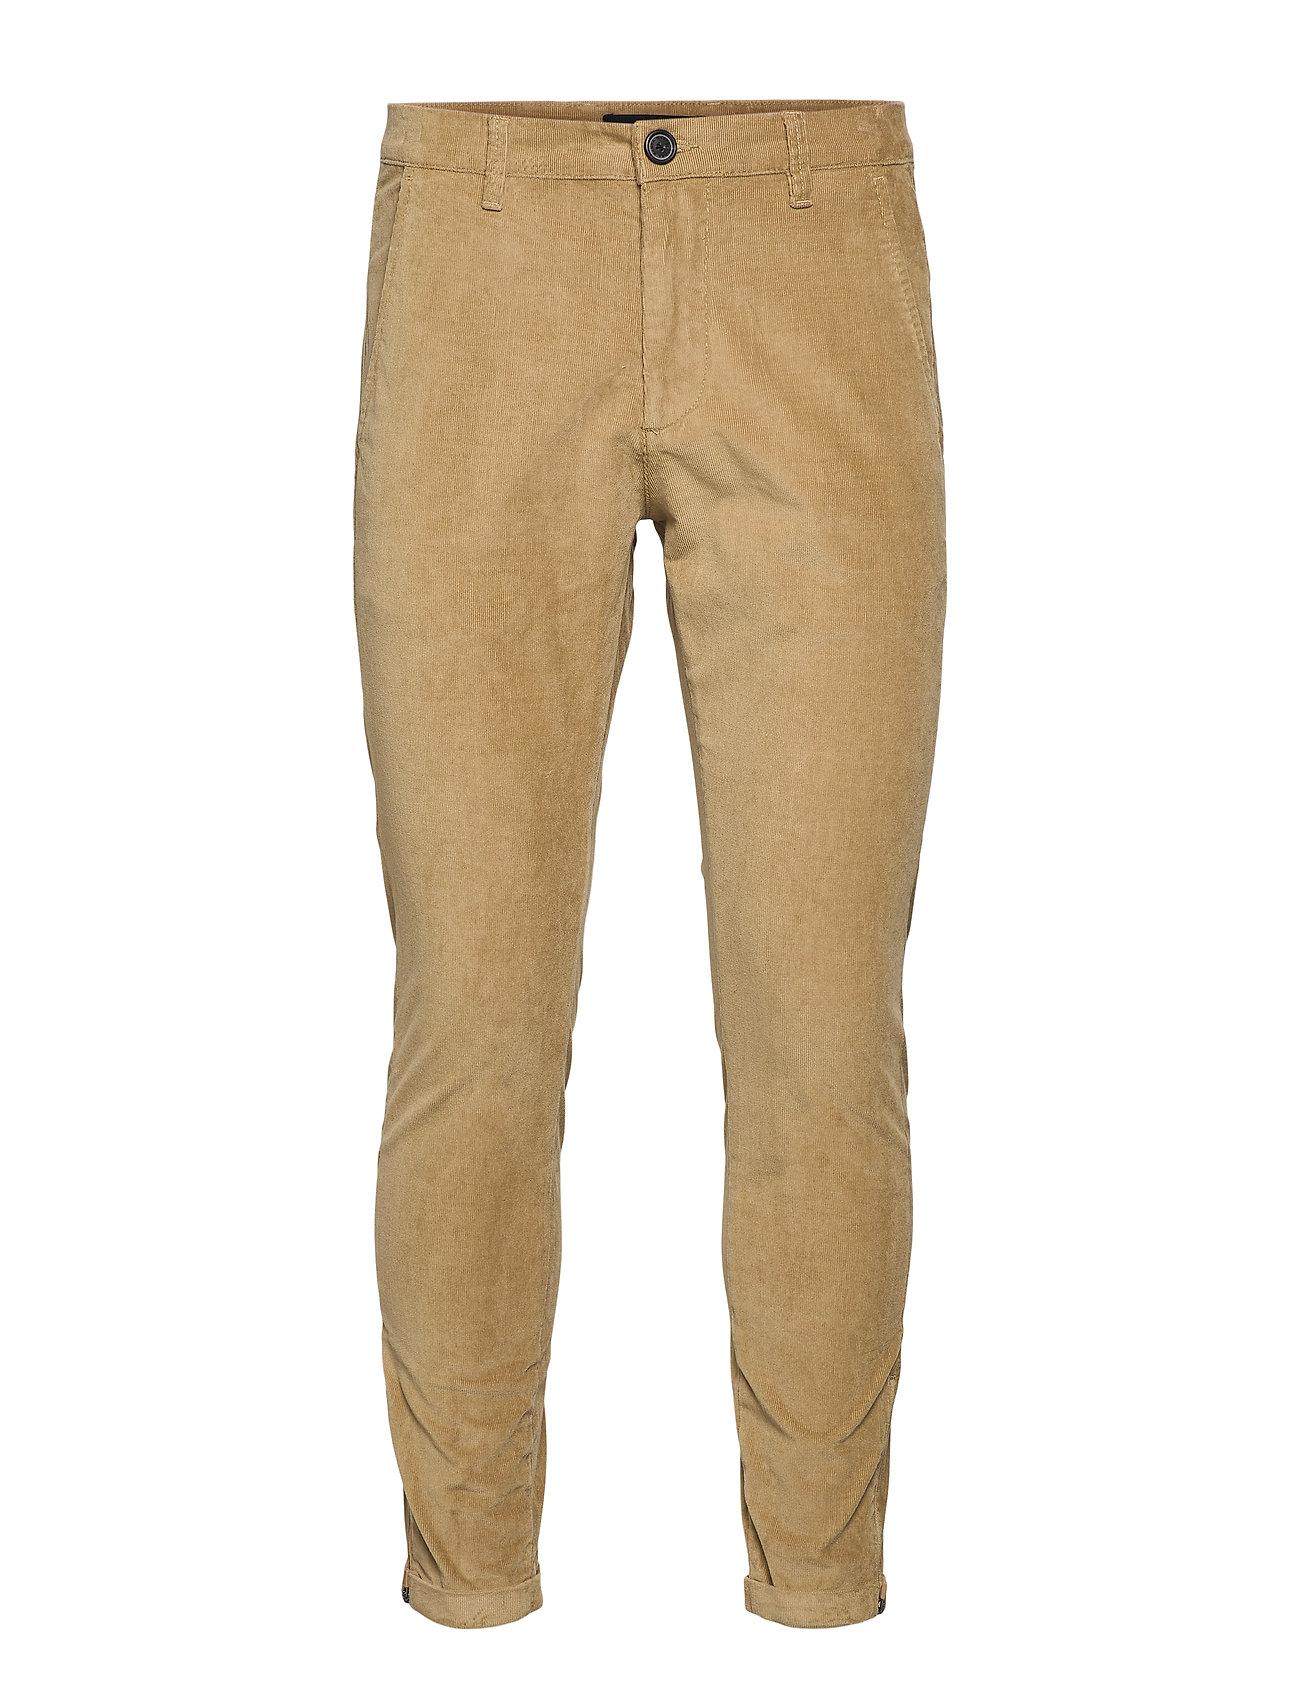 Image of Pisa Cord Pants Chinos Bukser Beige Gabba (3484278361)